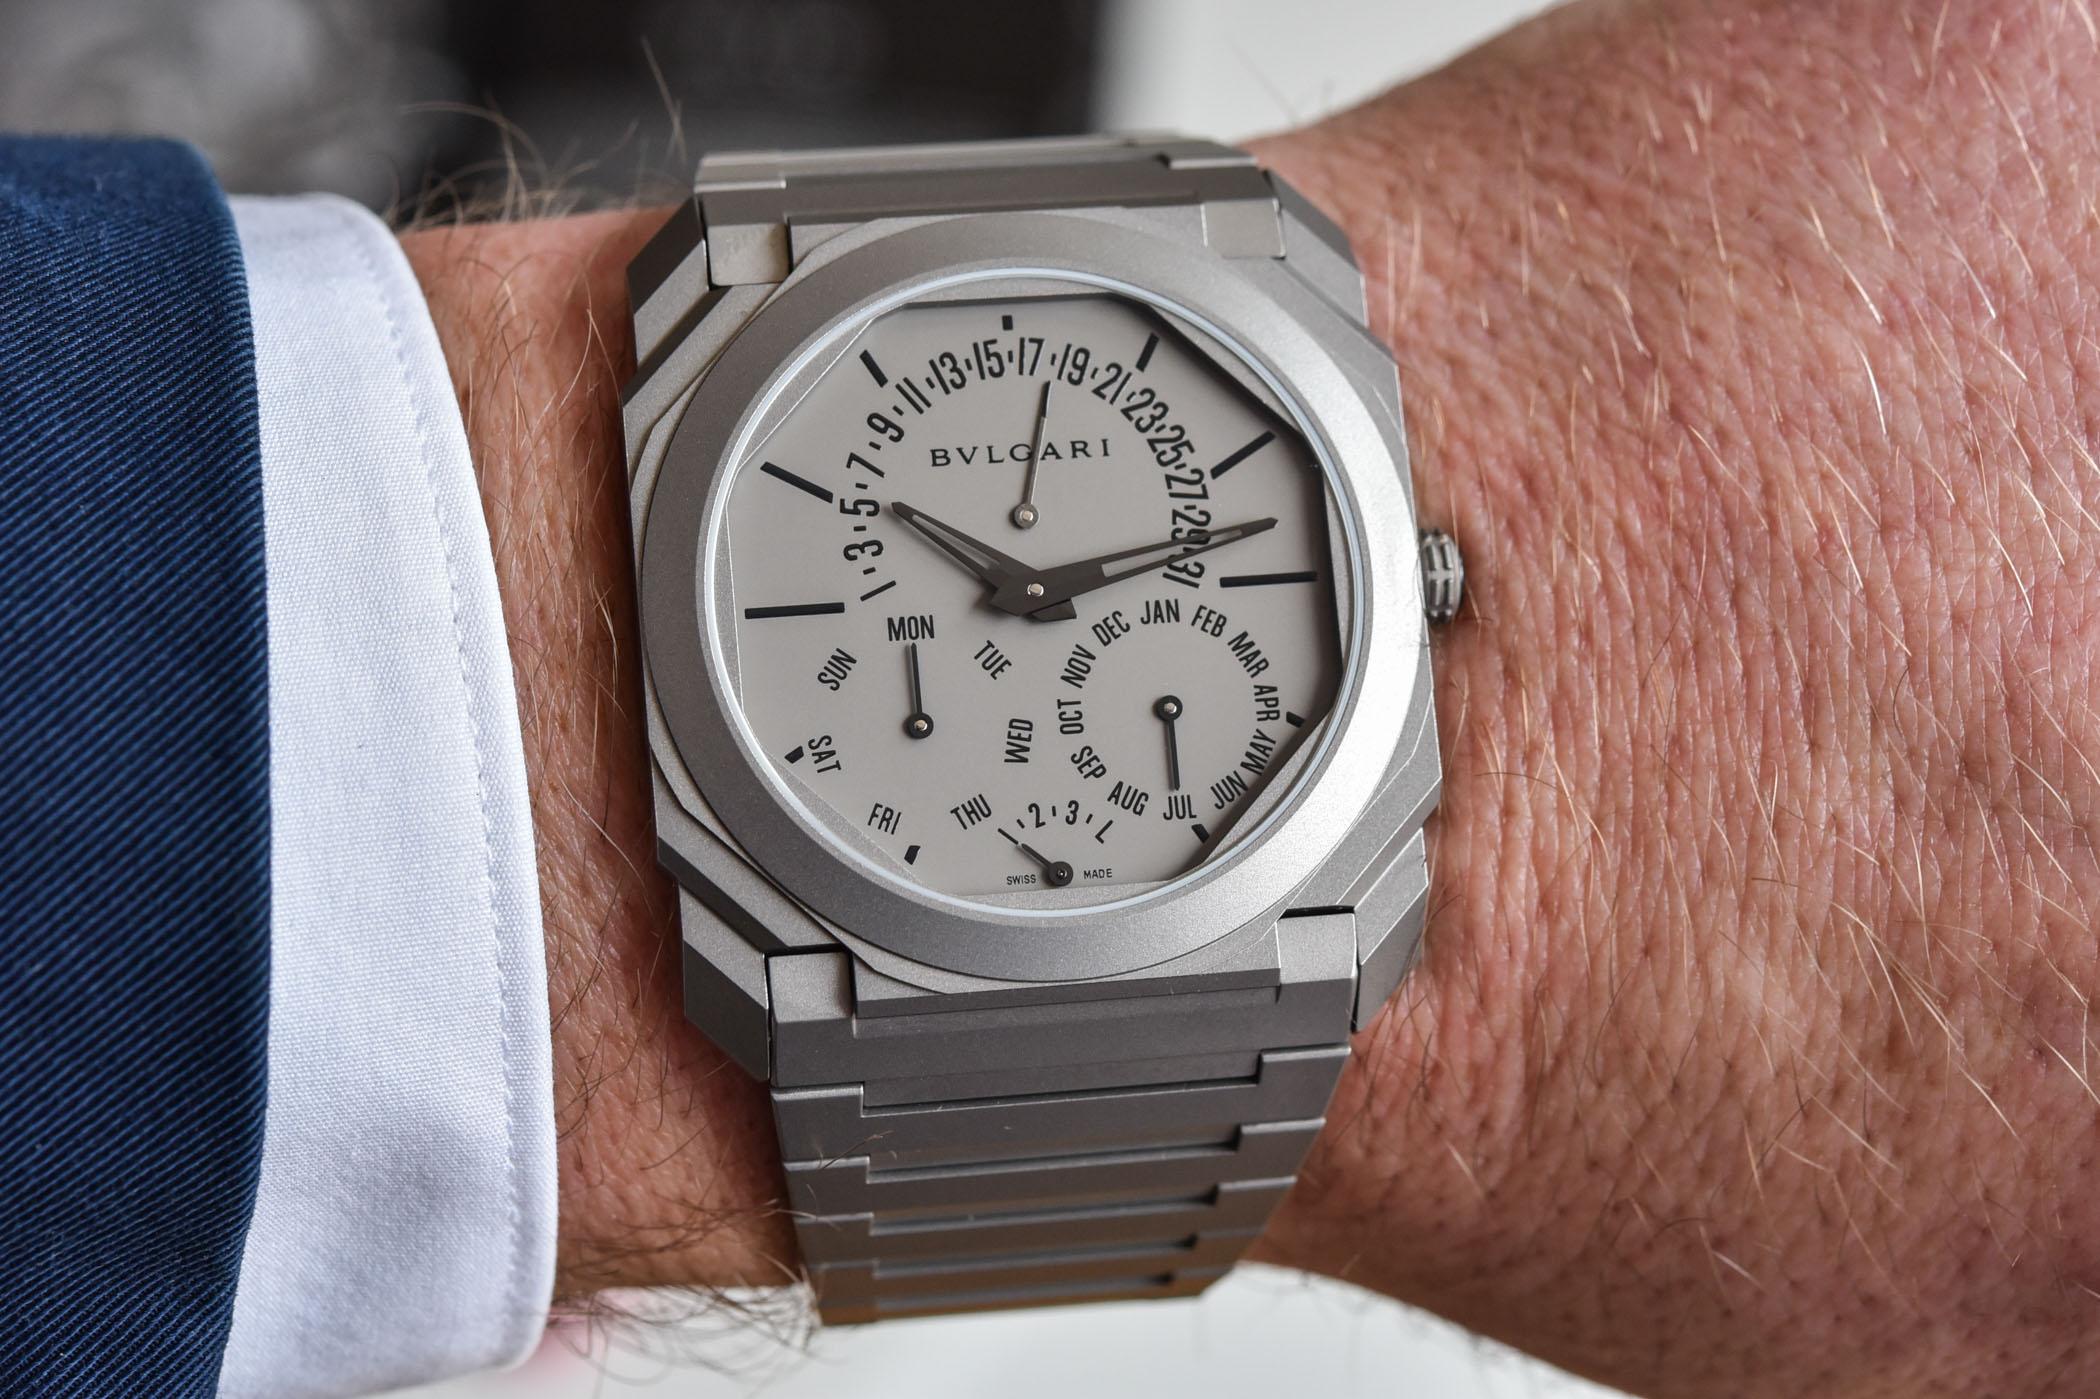 Bulgari Octo Finissimo Perpetual Calendar - world record thinnest perpetual calendar